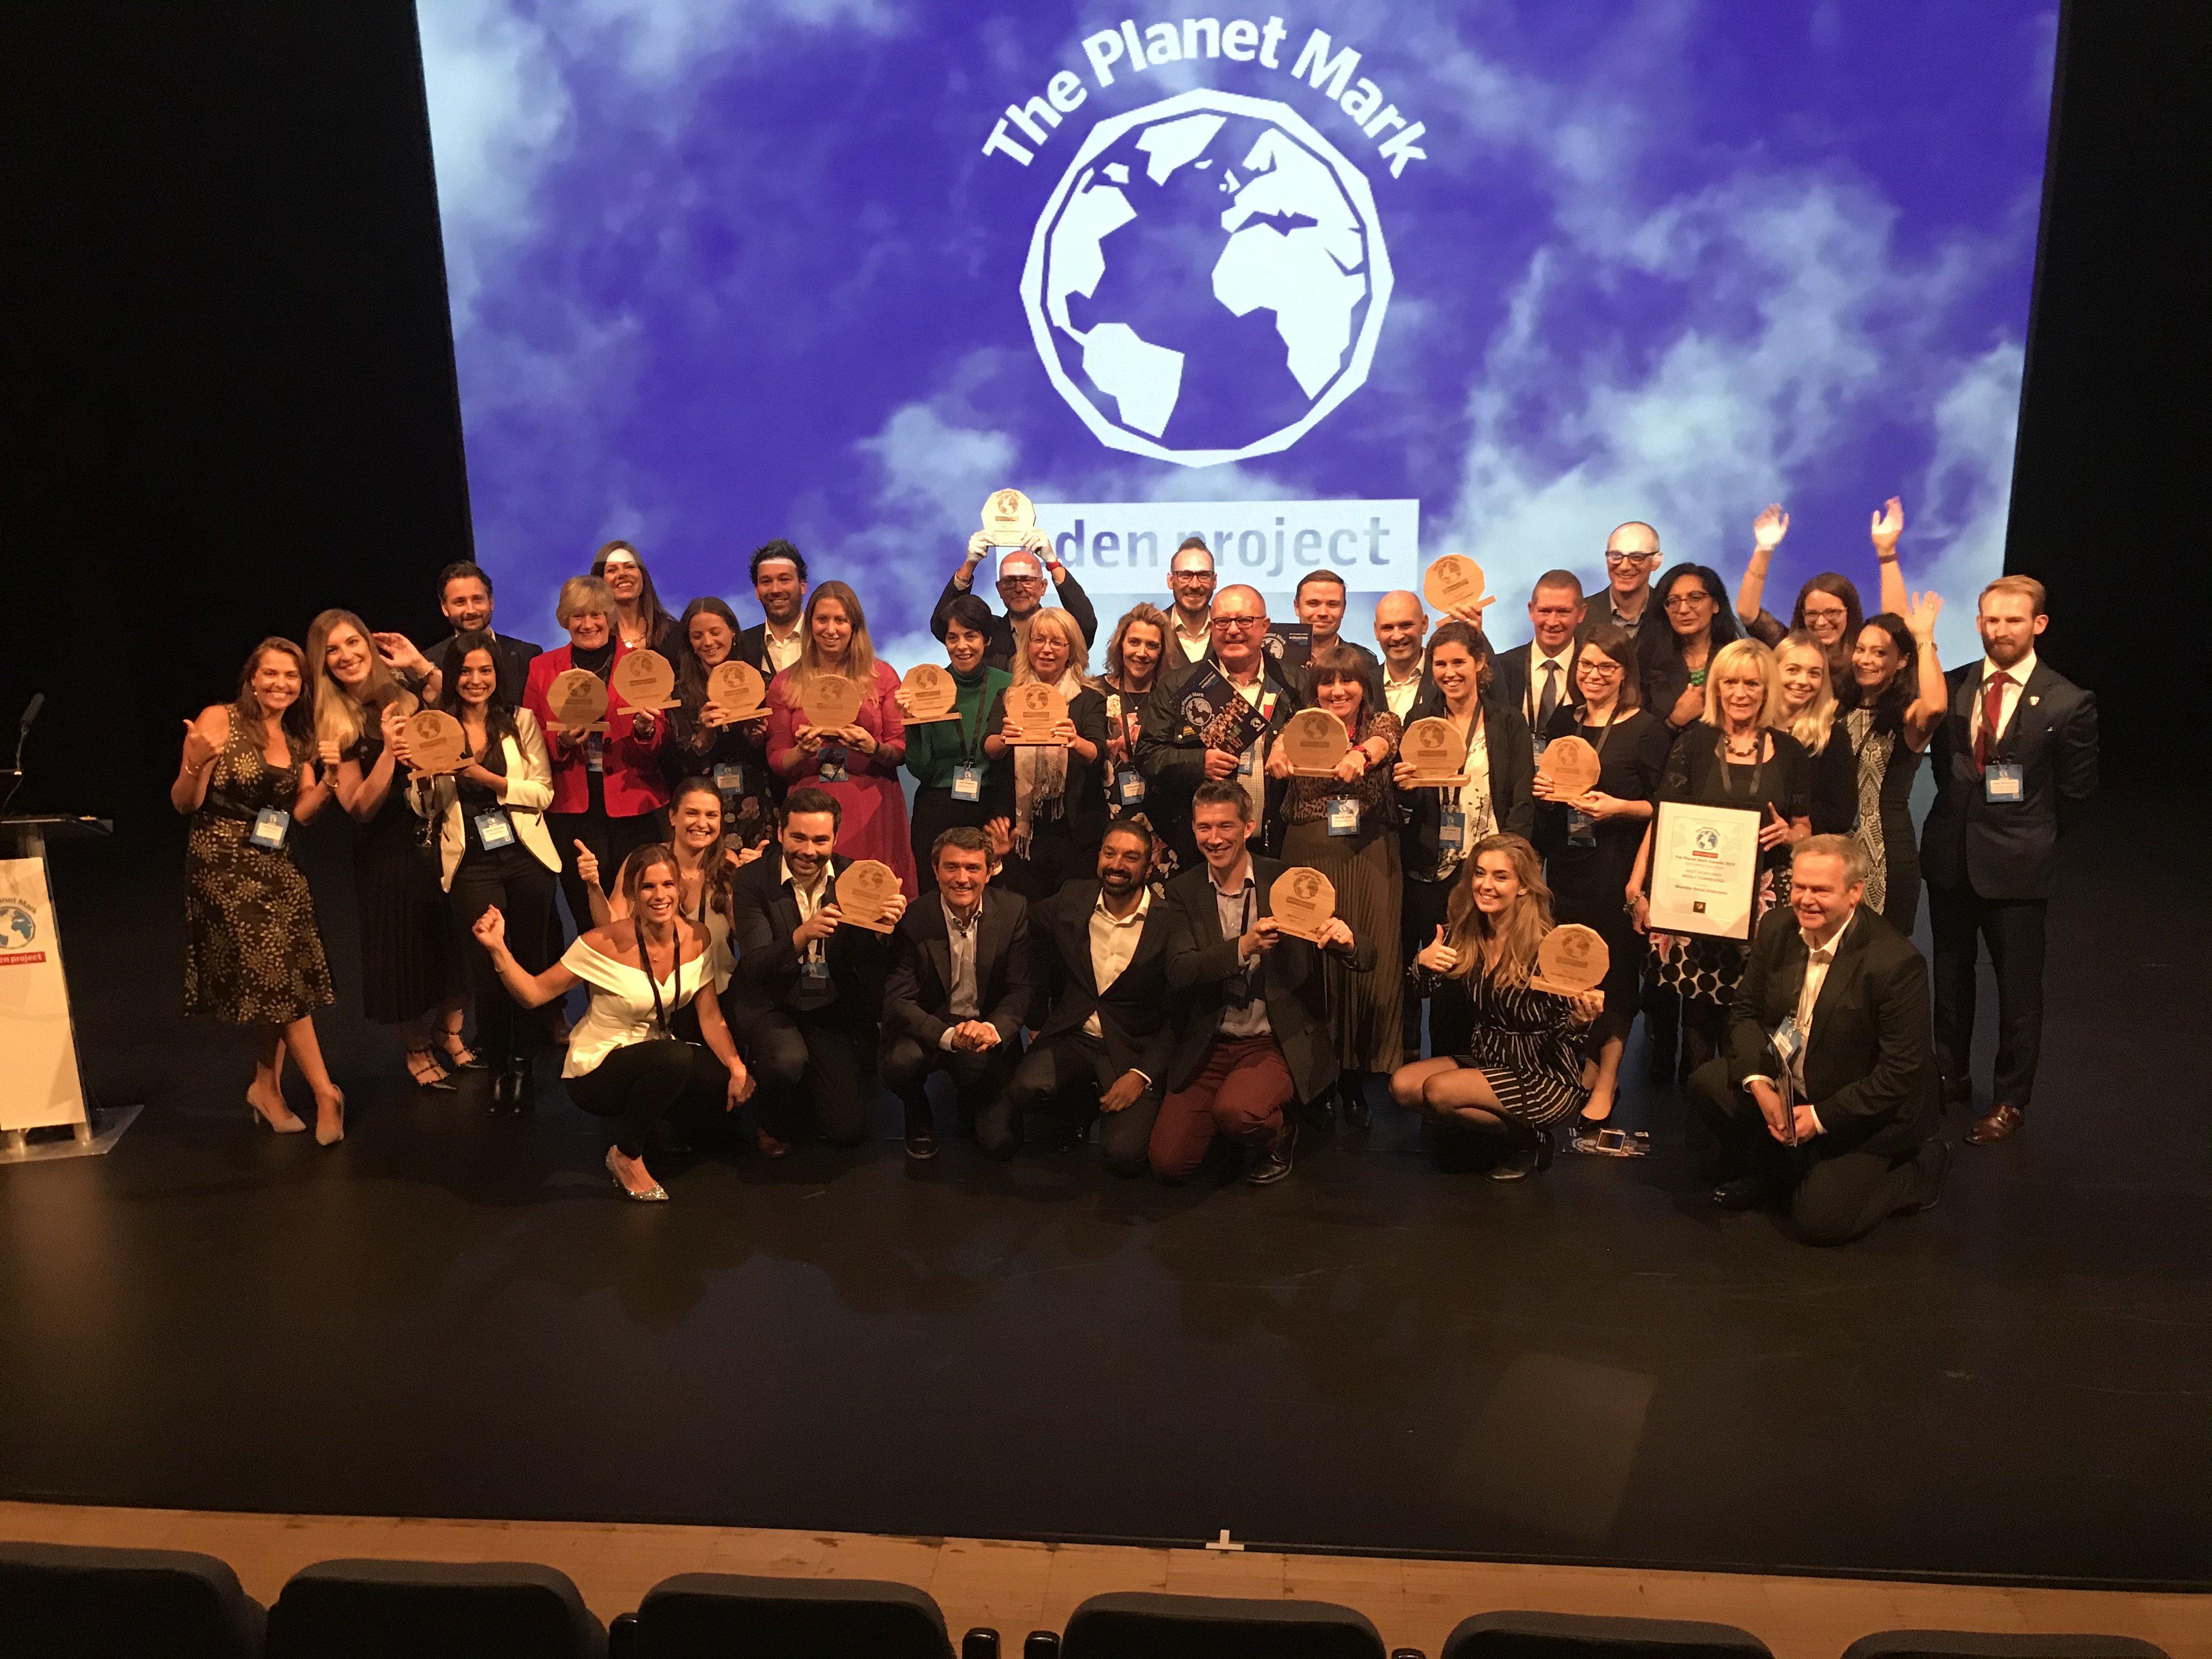 The Planet Mark Awards